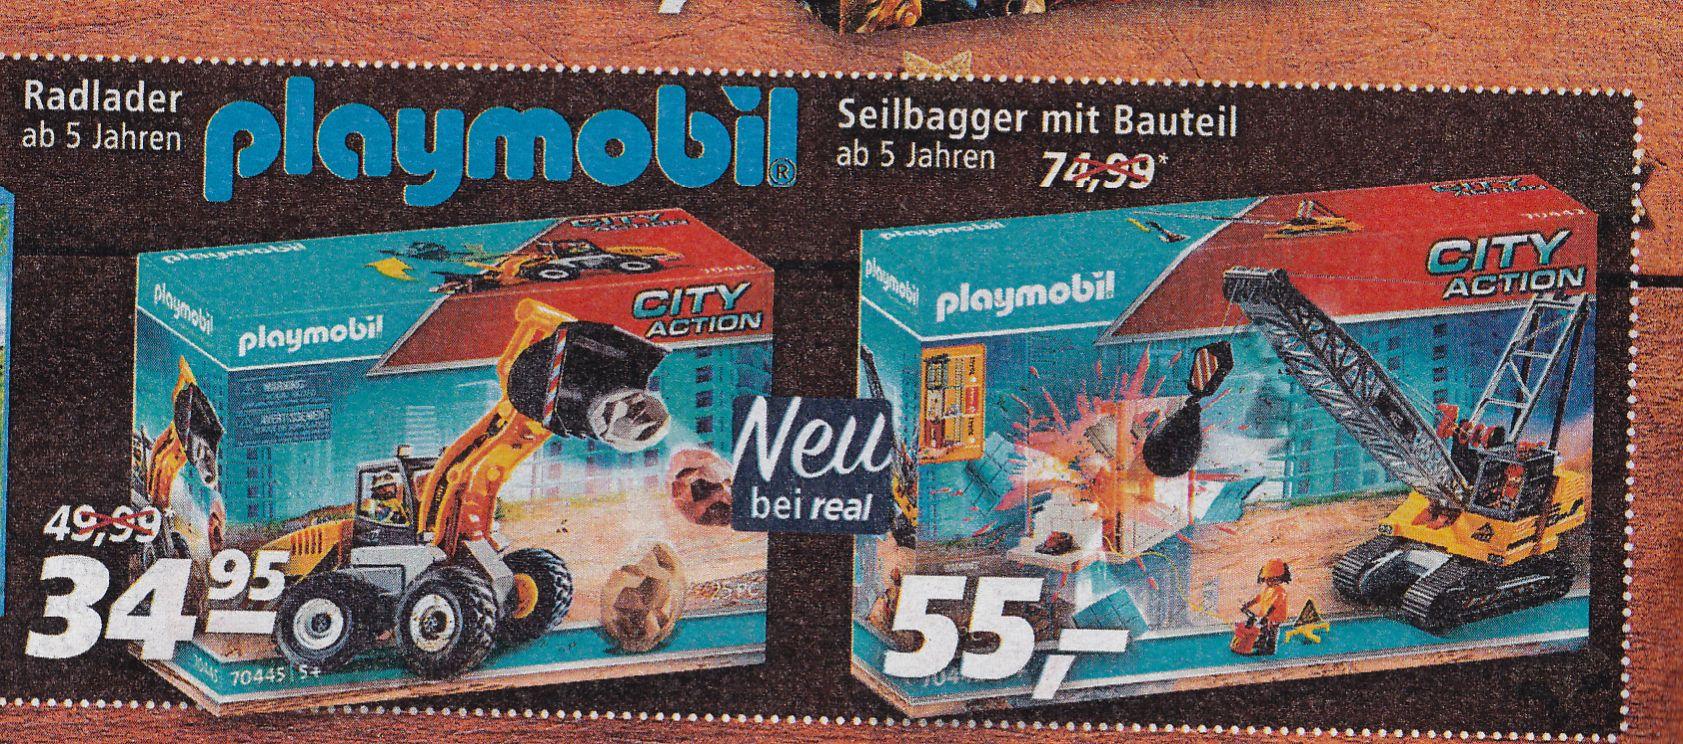 Playmobil Seilbagger (70442), Radlader (70445), real Family&Friends